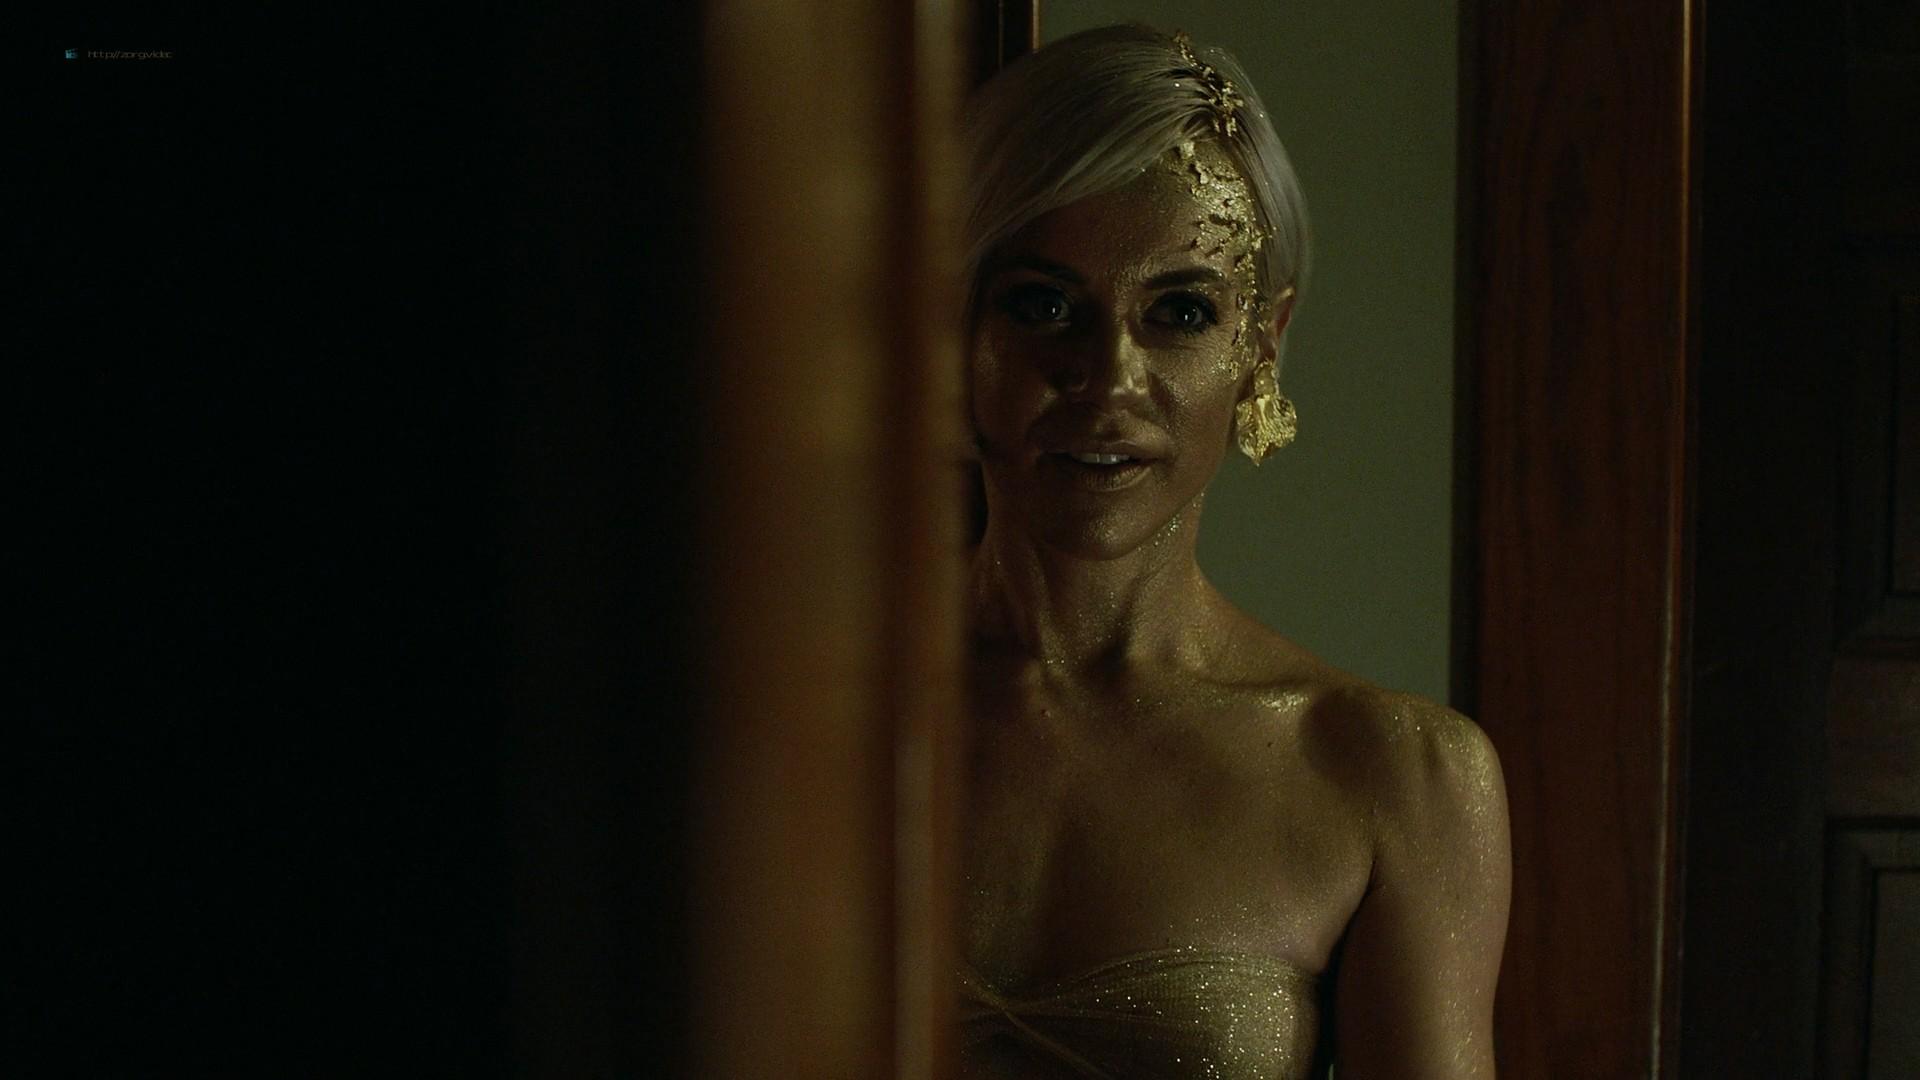 Trieste Kelly Dunn hot and Sarah Brooks nude sideboob - Girl on the Third Floor (2019) 1080 Web (9)